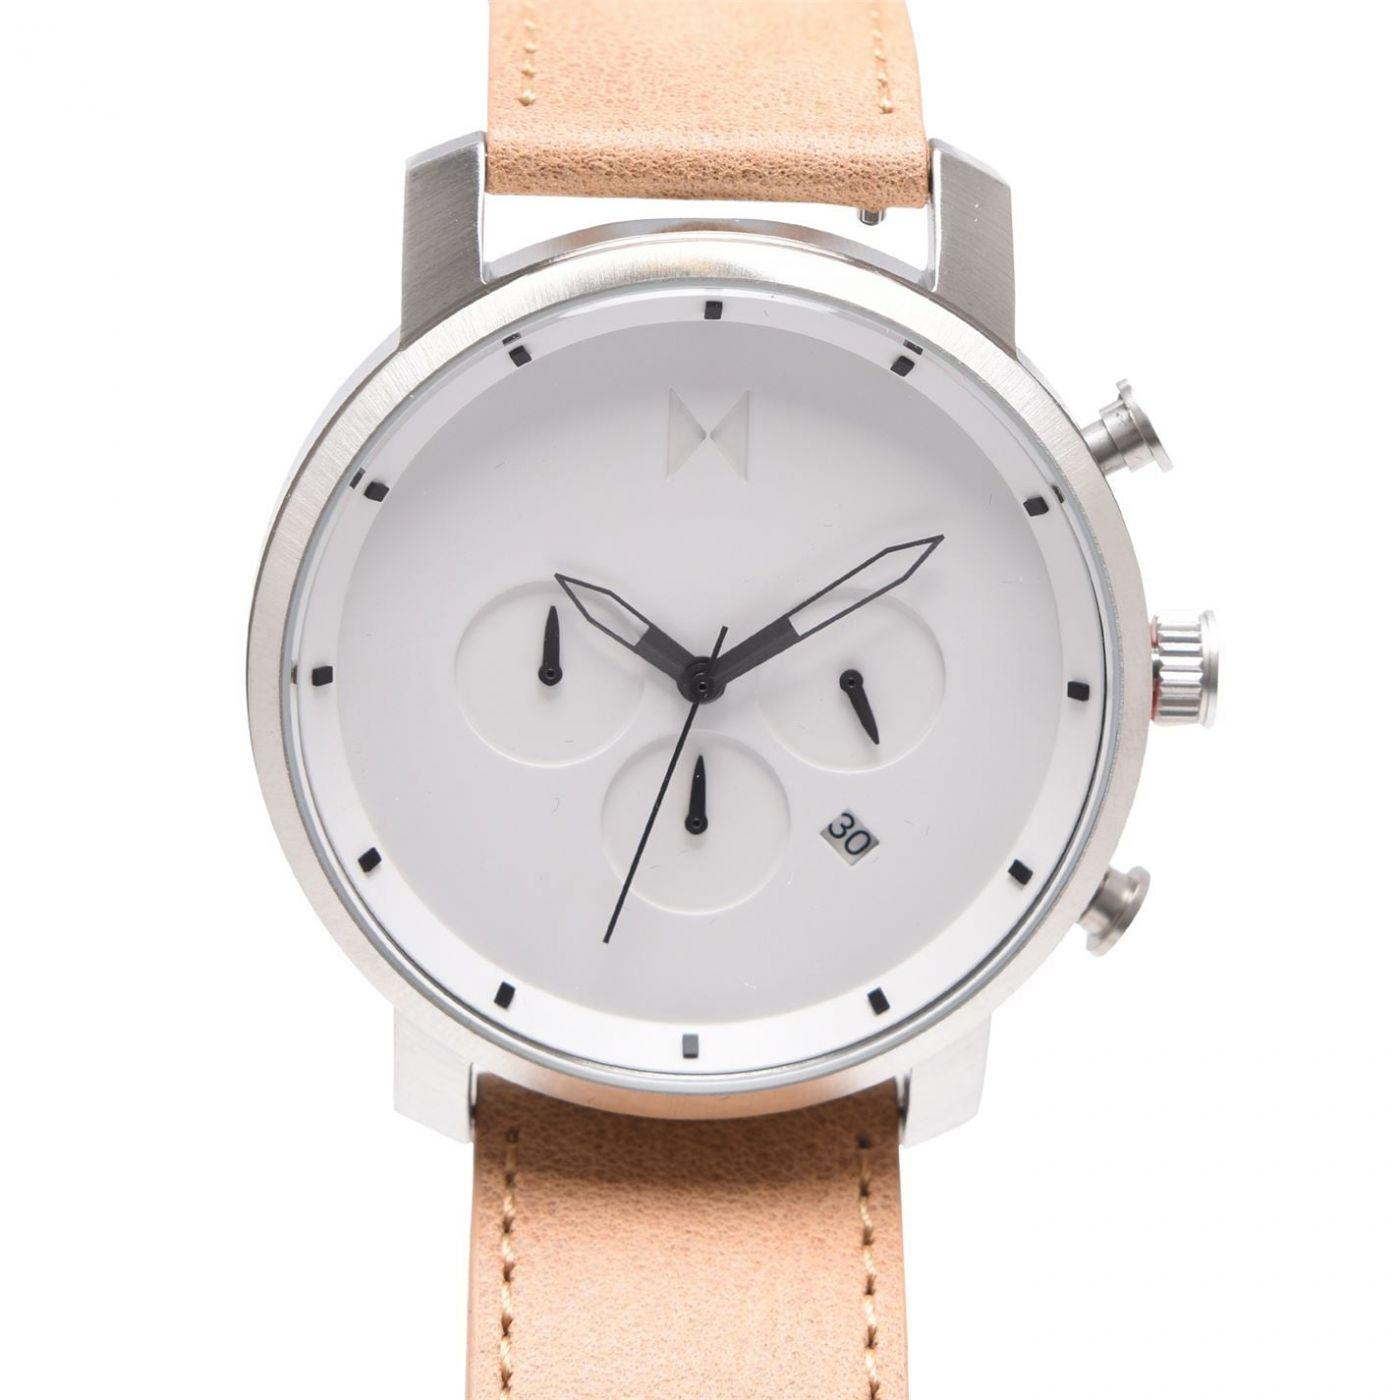 MVMT Chrono Leather Watch